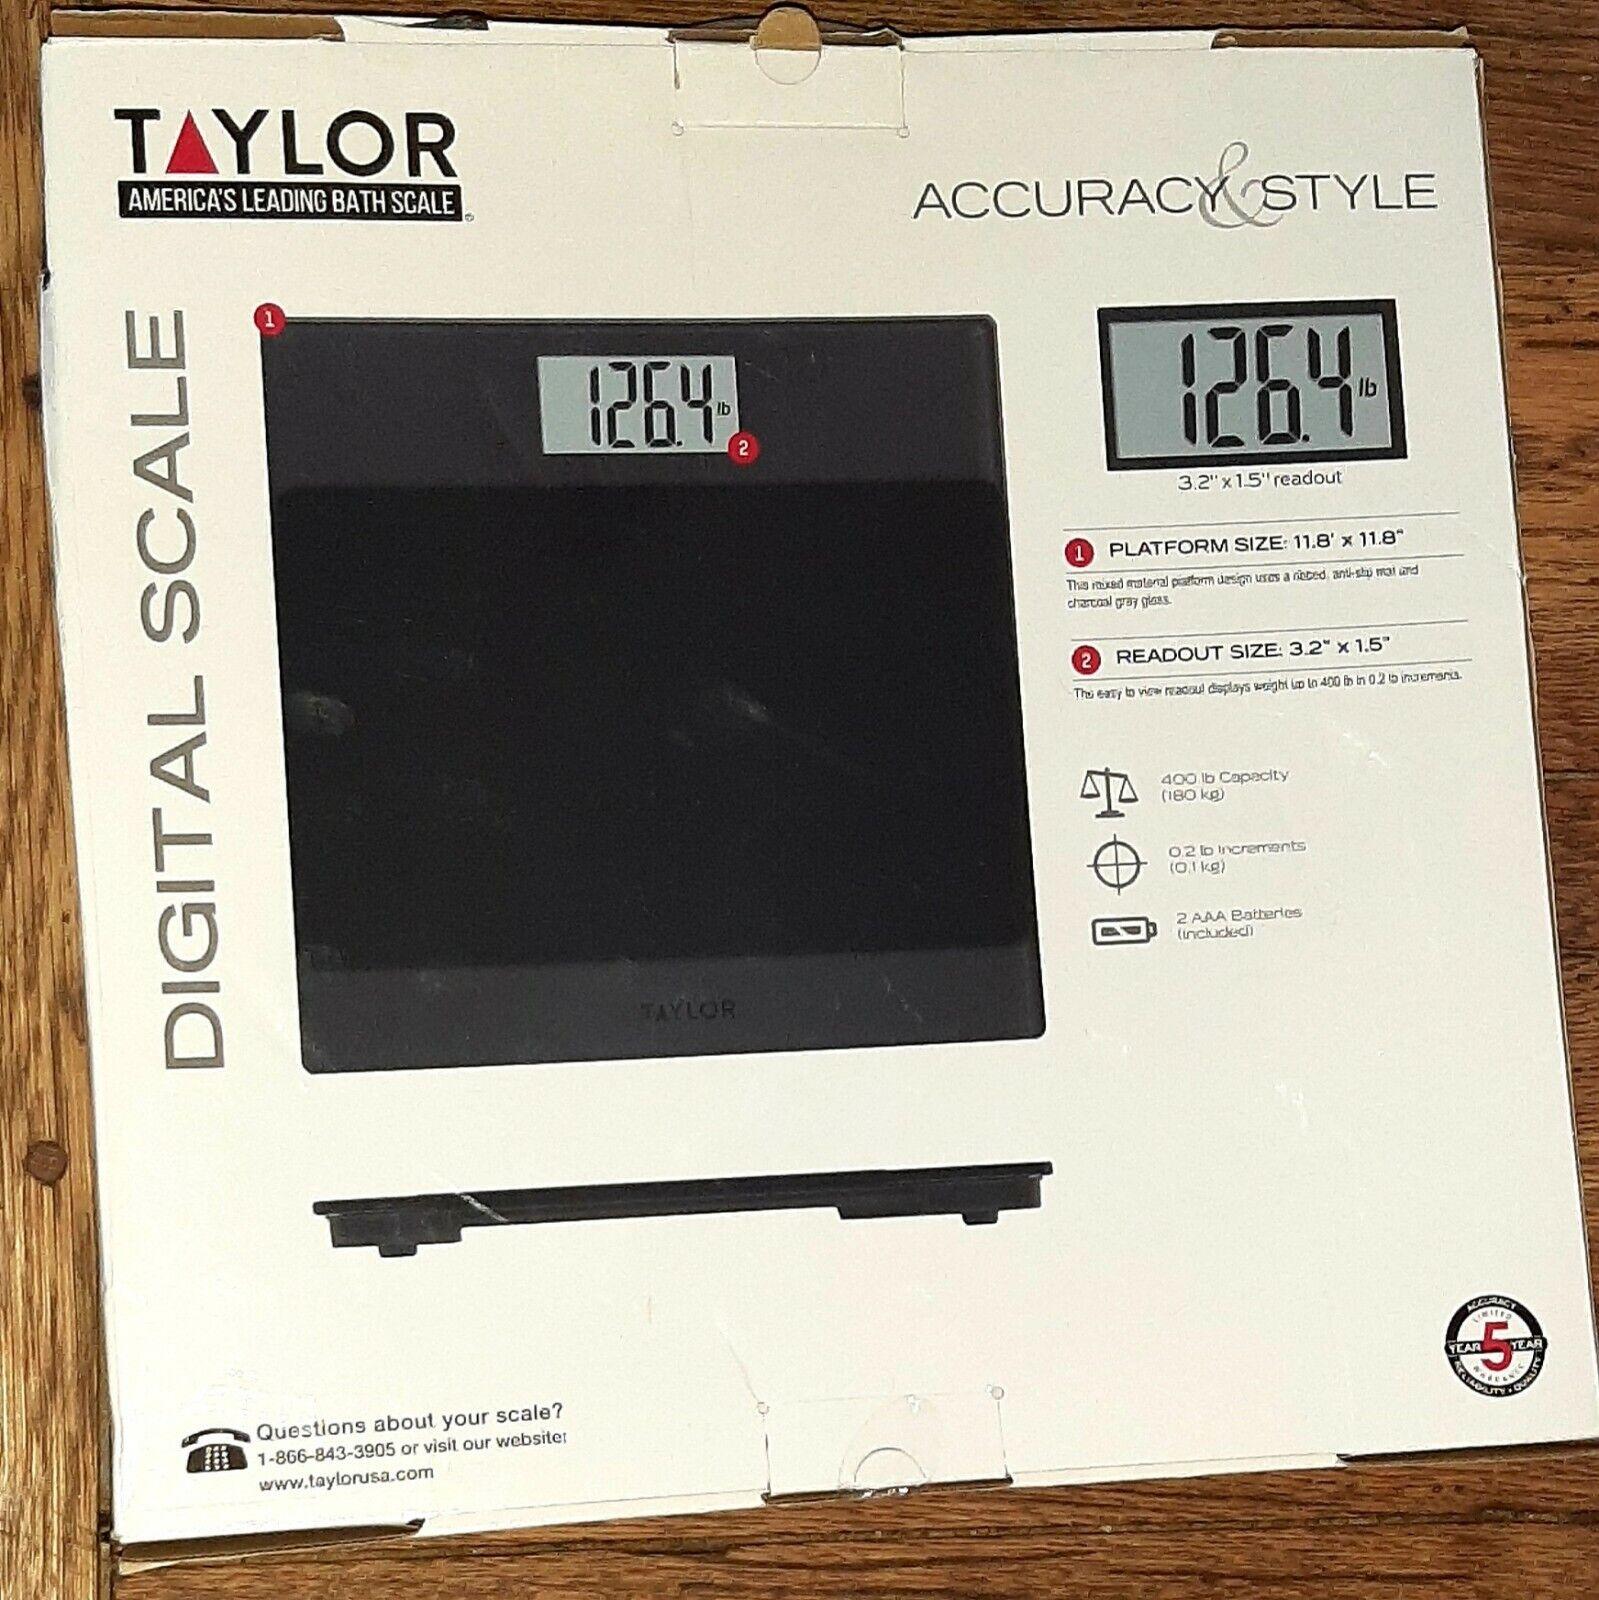 NEW TAYLOR 400 LB DIGITAL ANTI SLIP MAT BATHROOM SCALE BLACK 2- AA BATTERIES INC